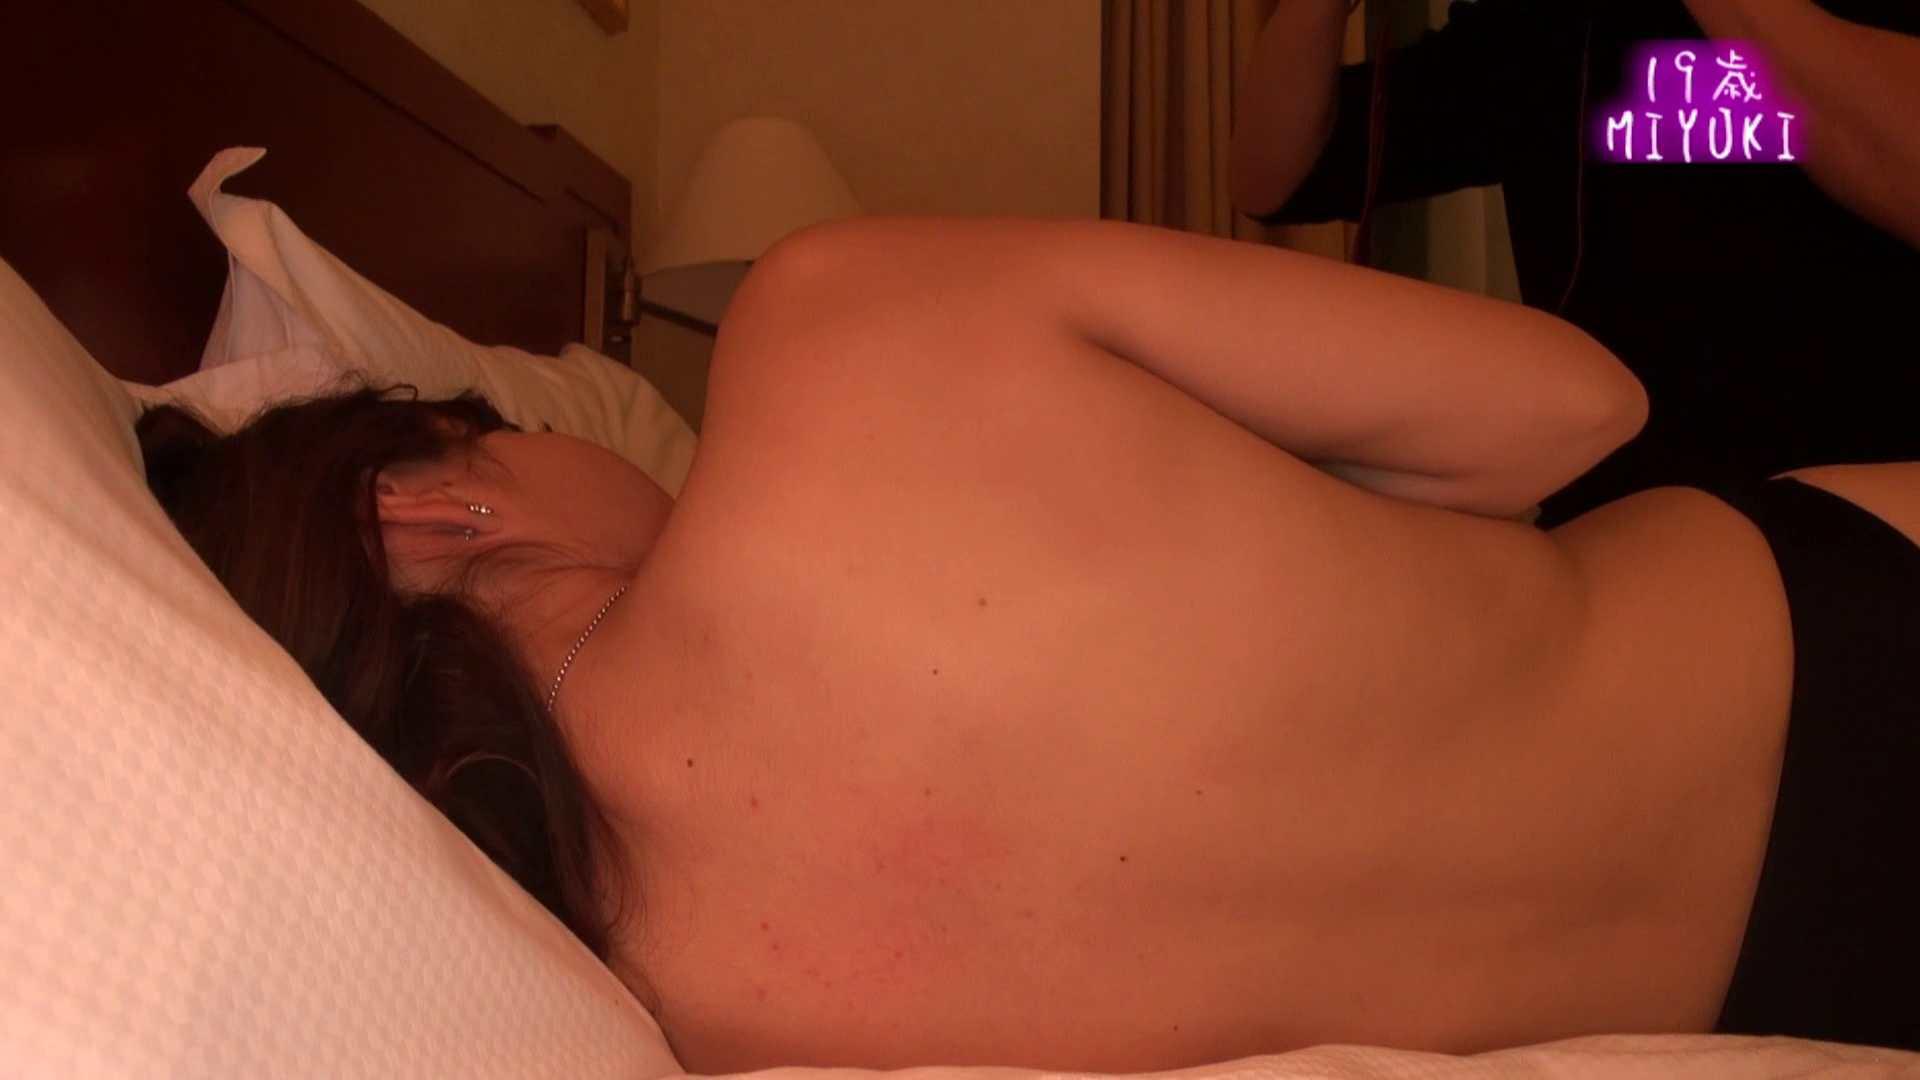 MIYUKIちゃんに男優さんがエロマッサージ マッサージ セックス画像 104pic 71